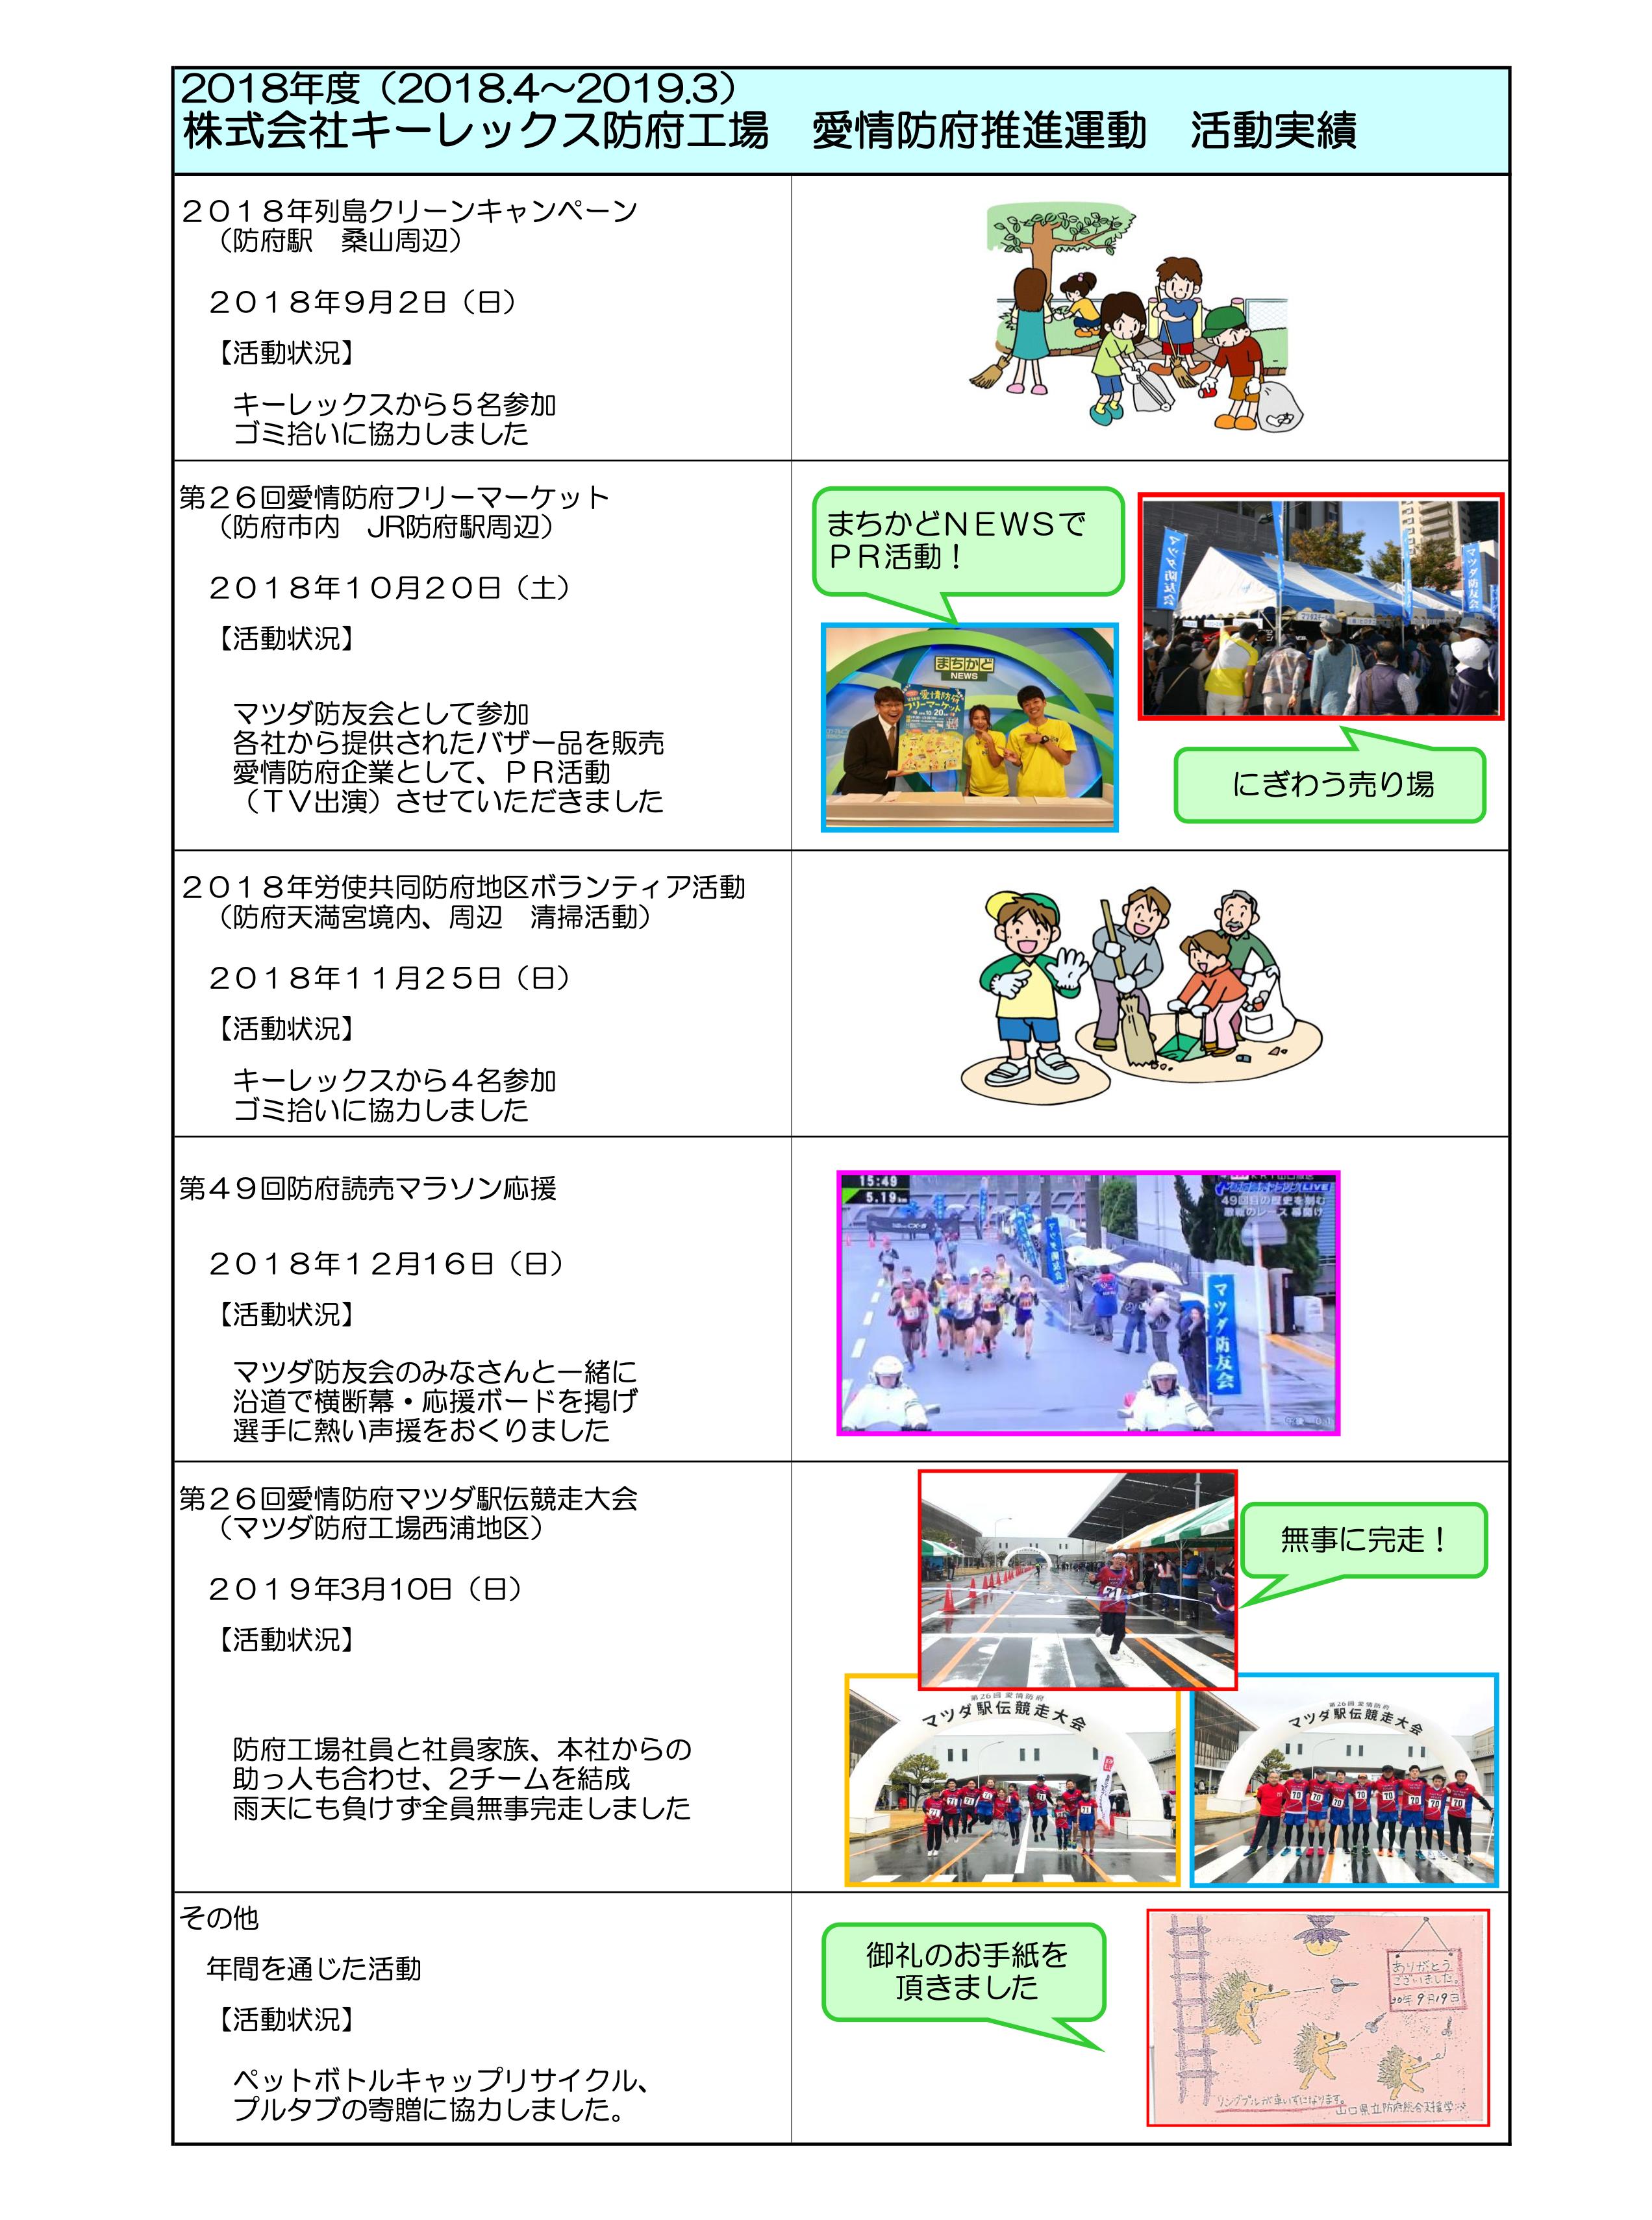 株式会社キーレックス防府工場 愛情防府推進運動